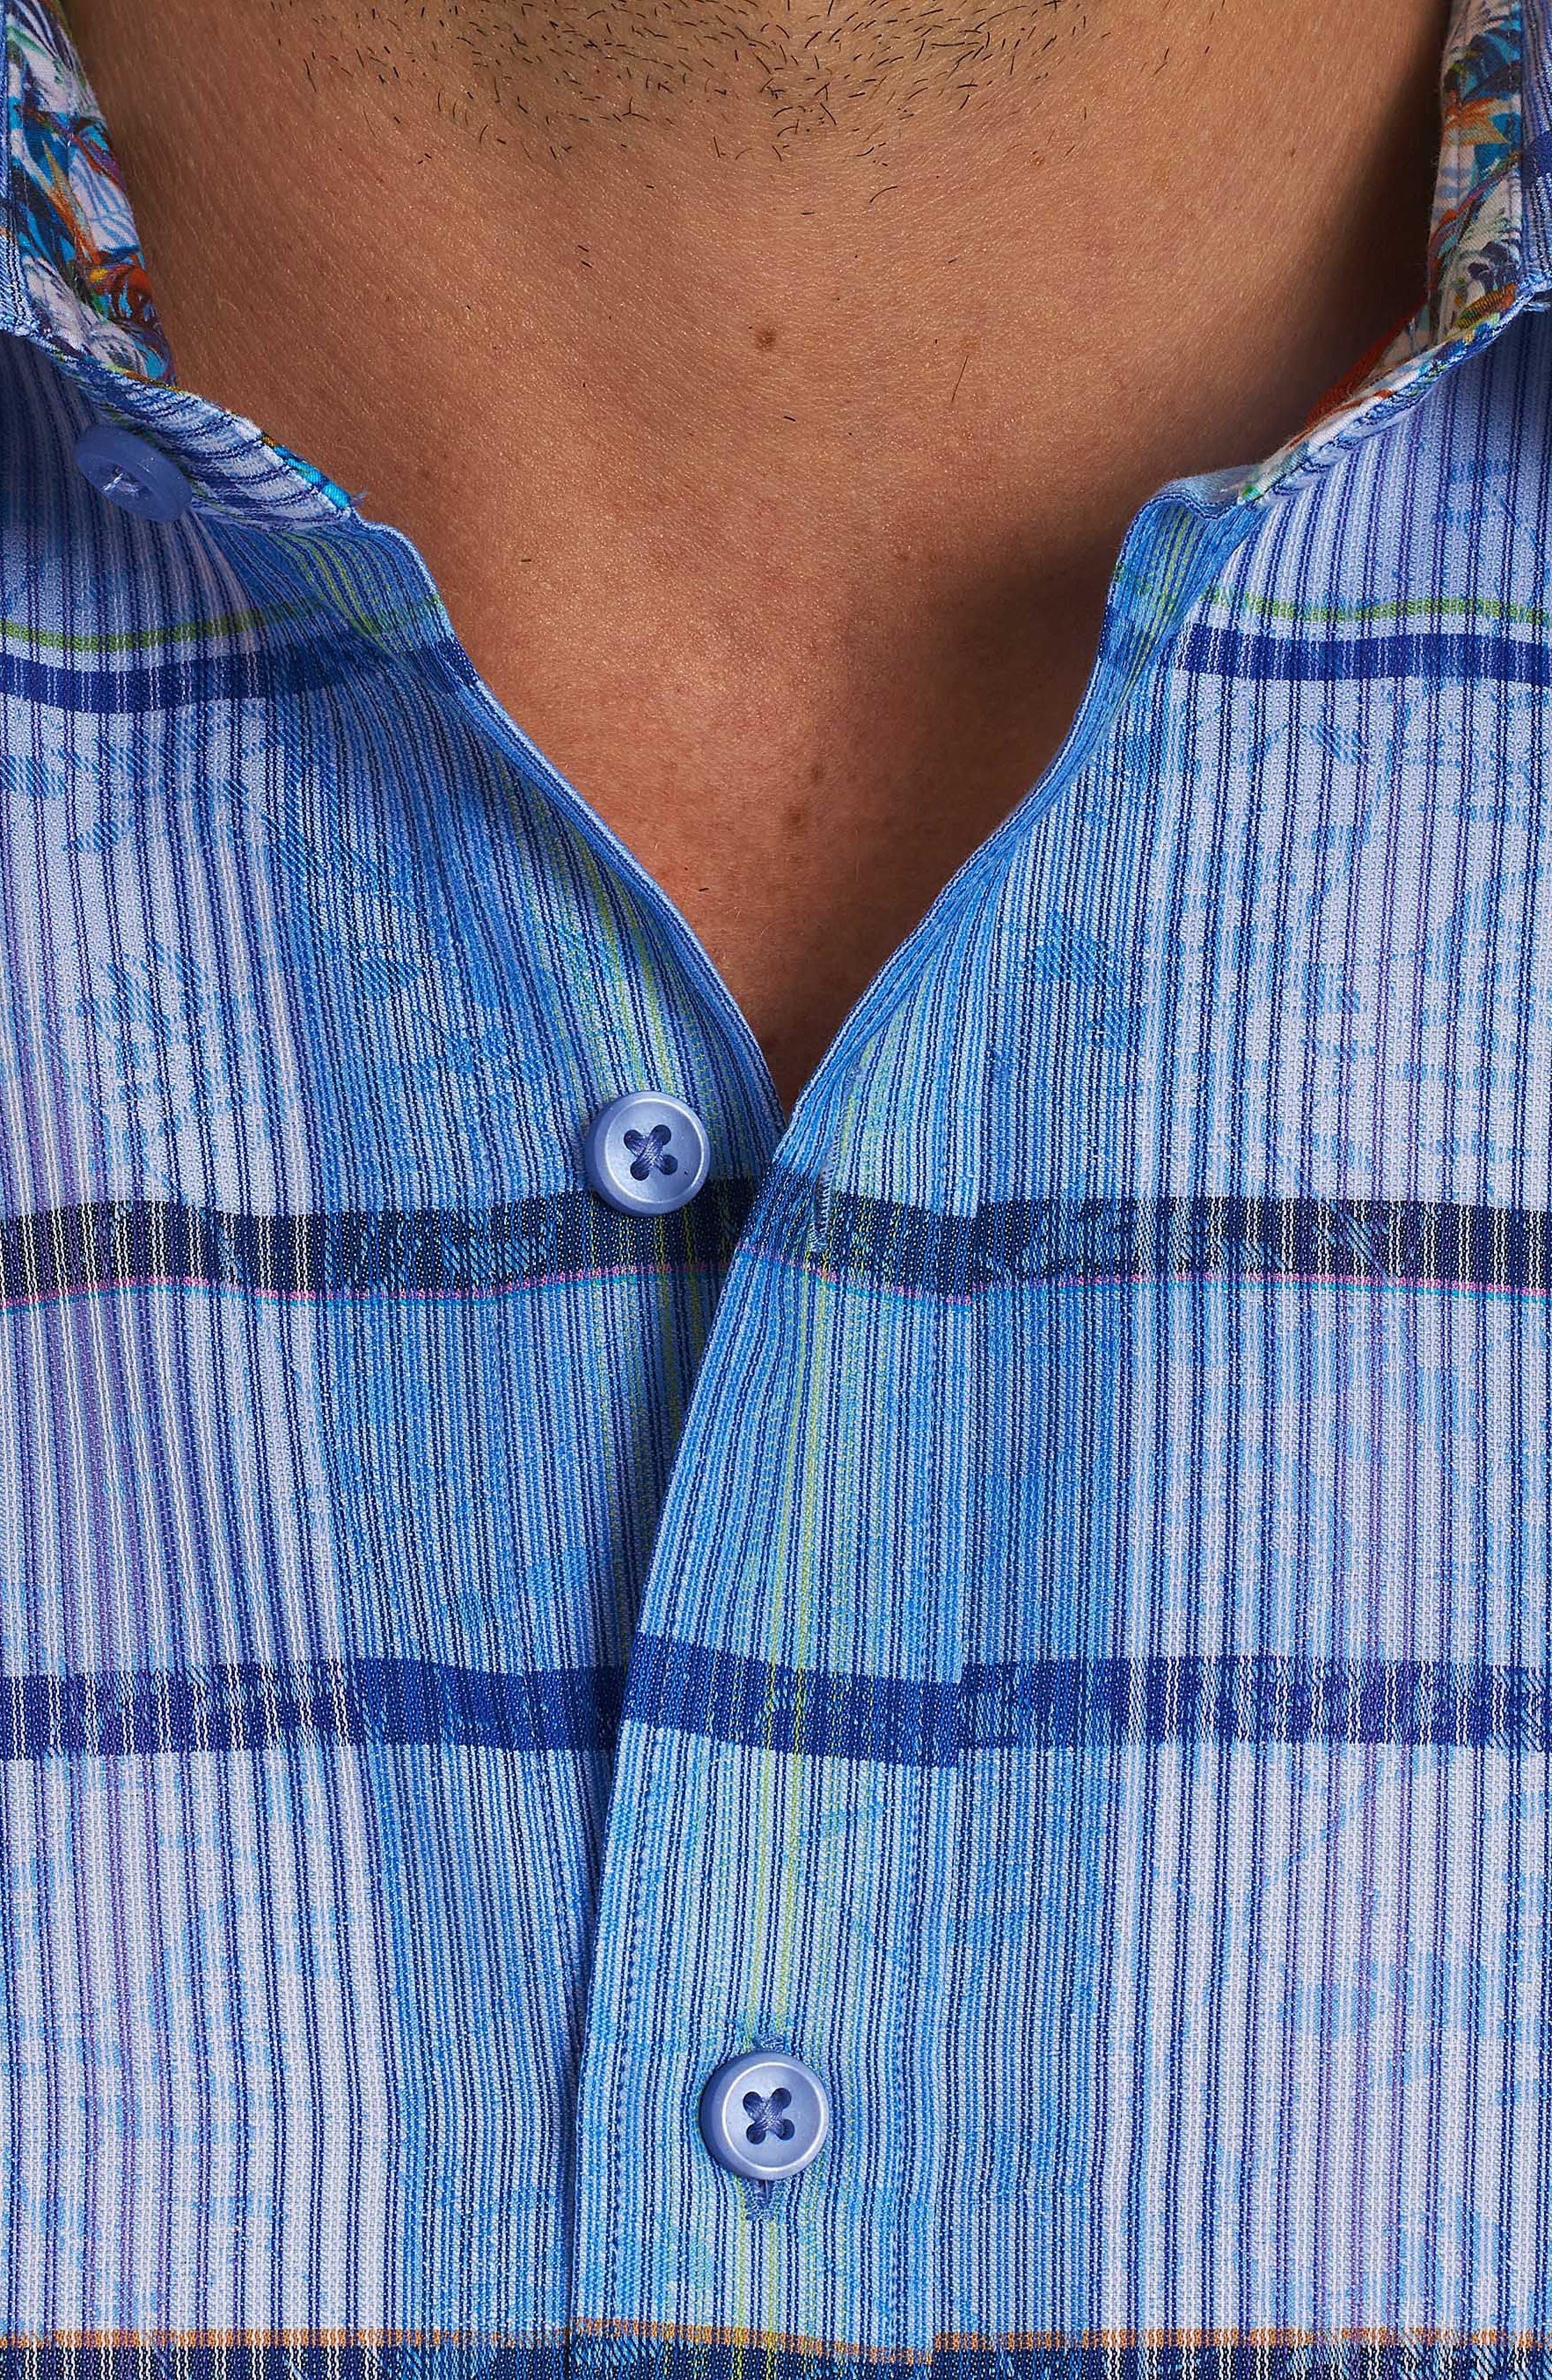 Ferro Classic Fit Sport Shirt,                             Alternate thumbnail 4, color,                             Blue